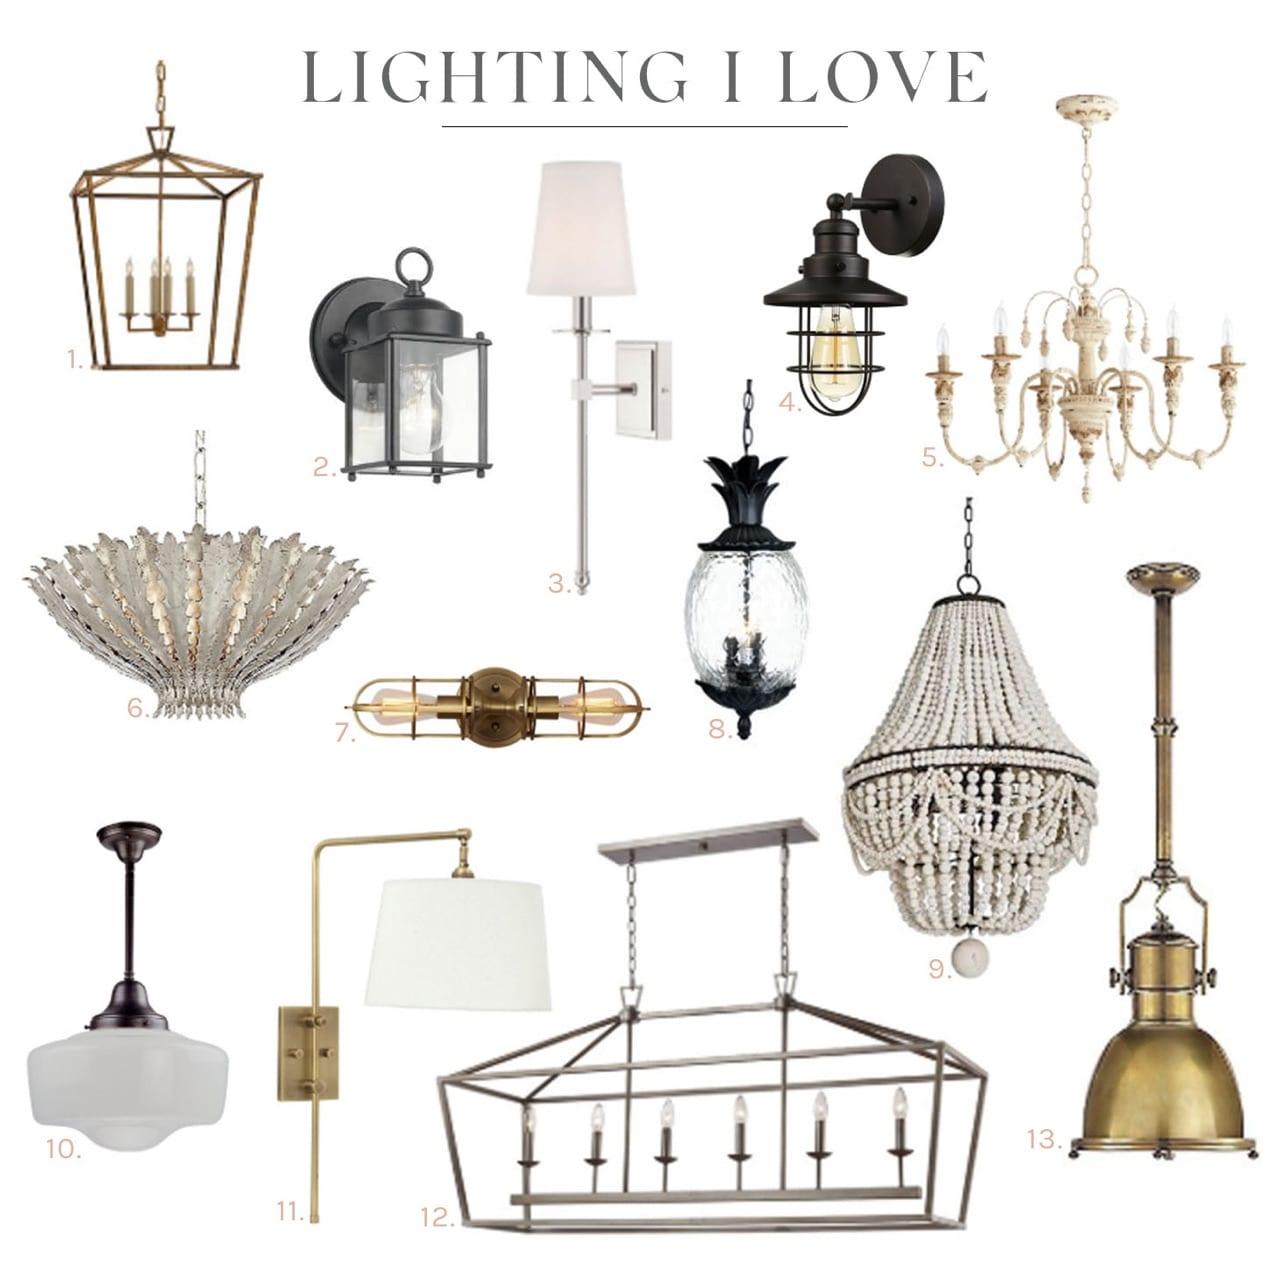 In My Home: Lighting I Love